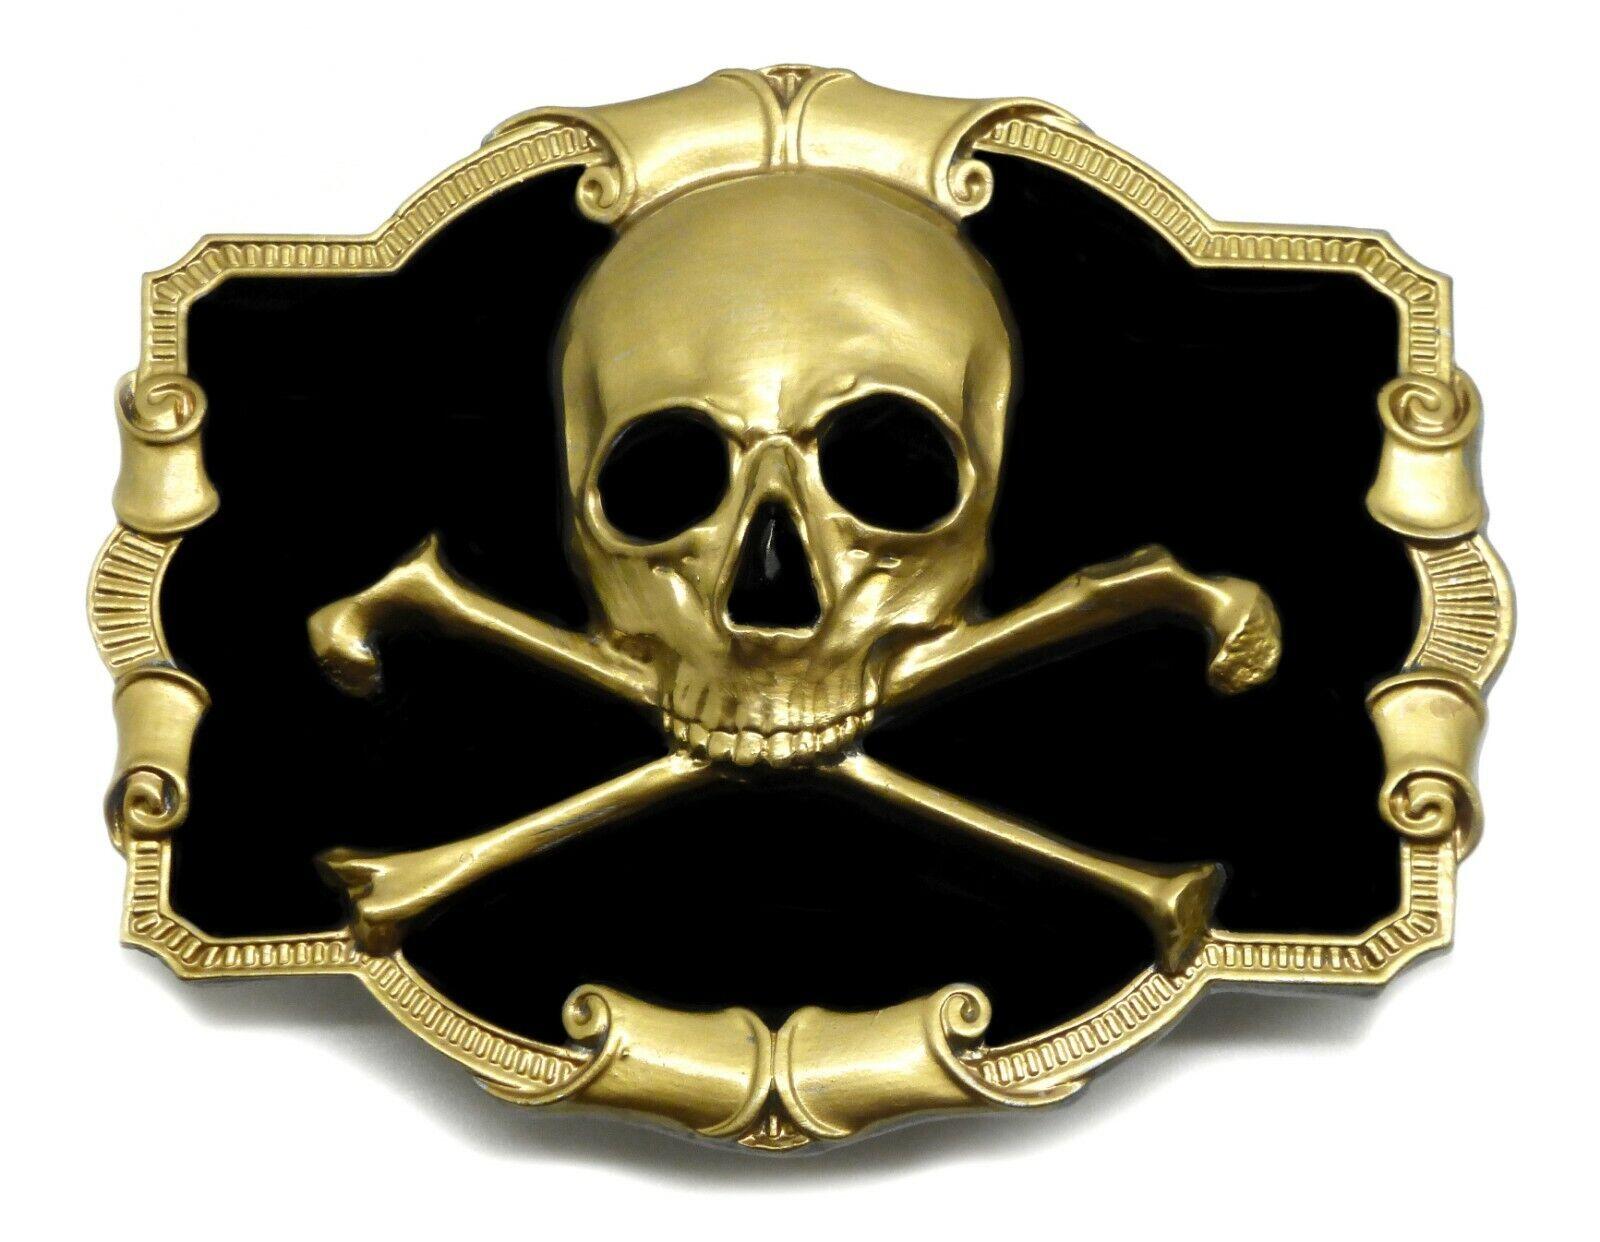 Skull & Crossed Bones Belt Buckle Black & Gold Design Authentic Dragon Designs